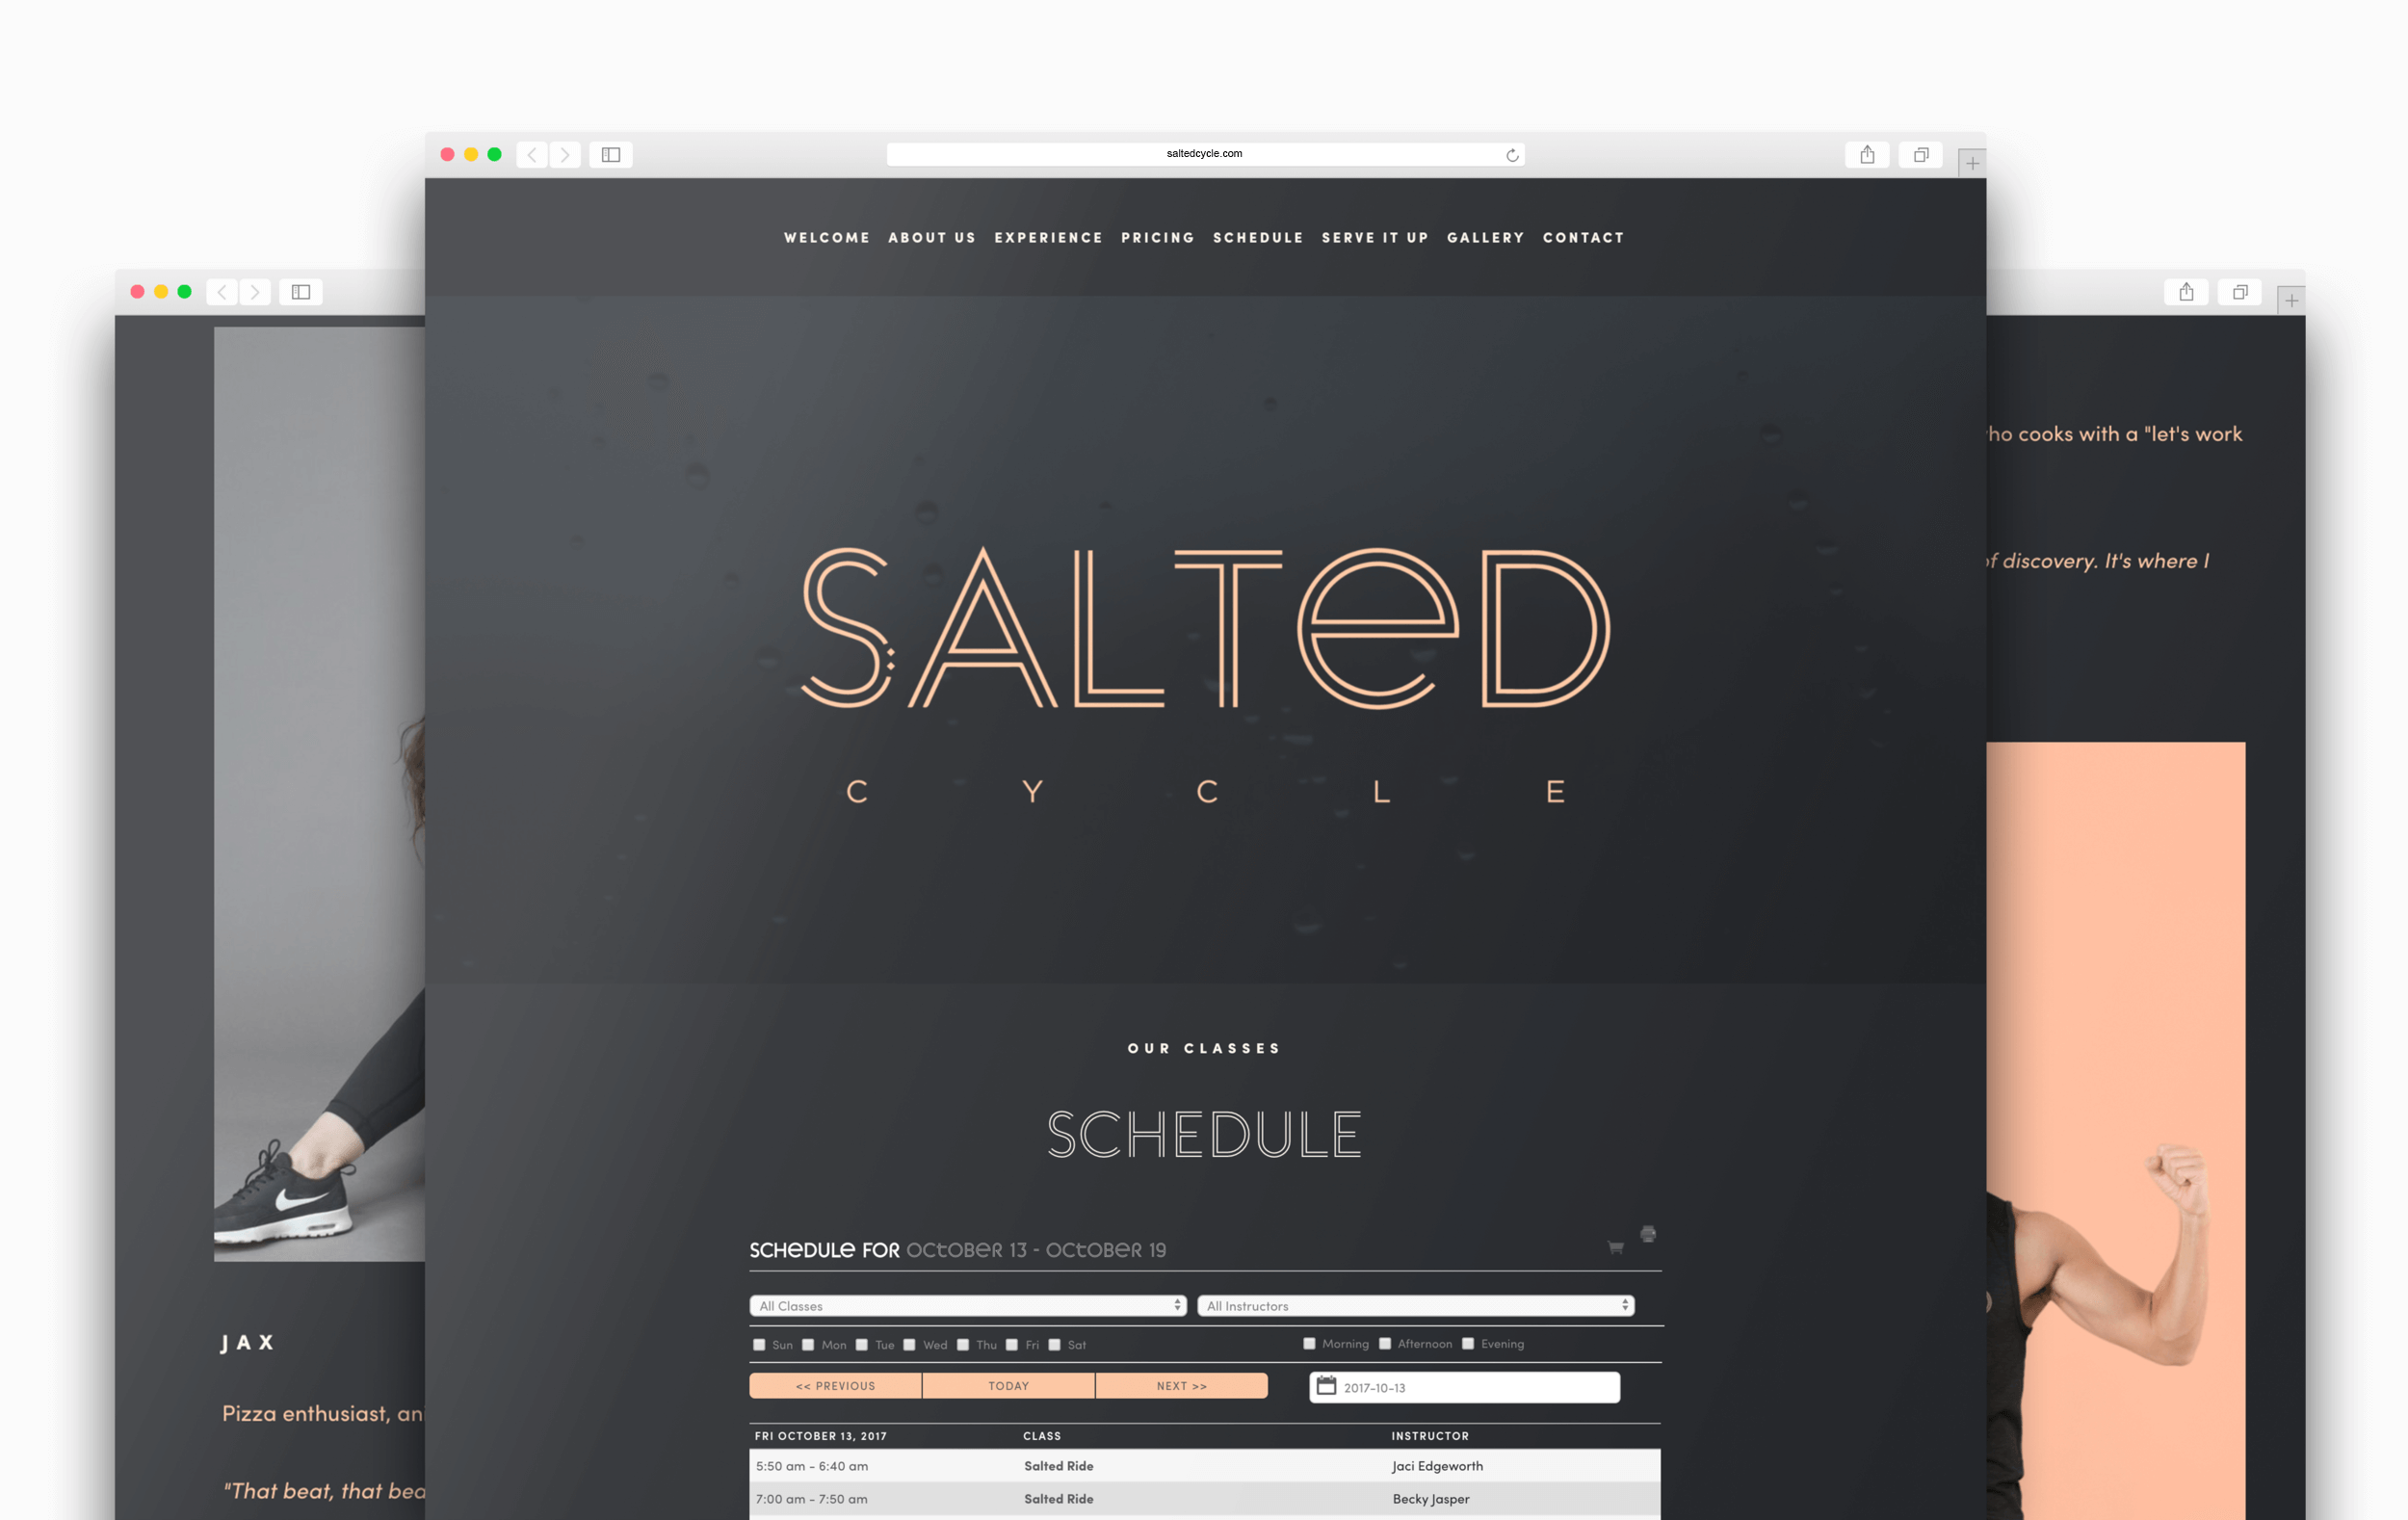 Millie_SaltedCycle_WebsiteDesign_3PageSample